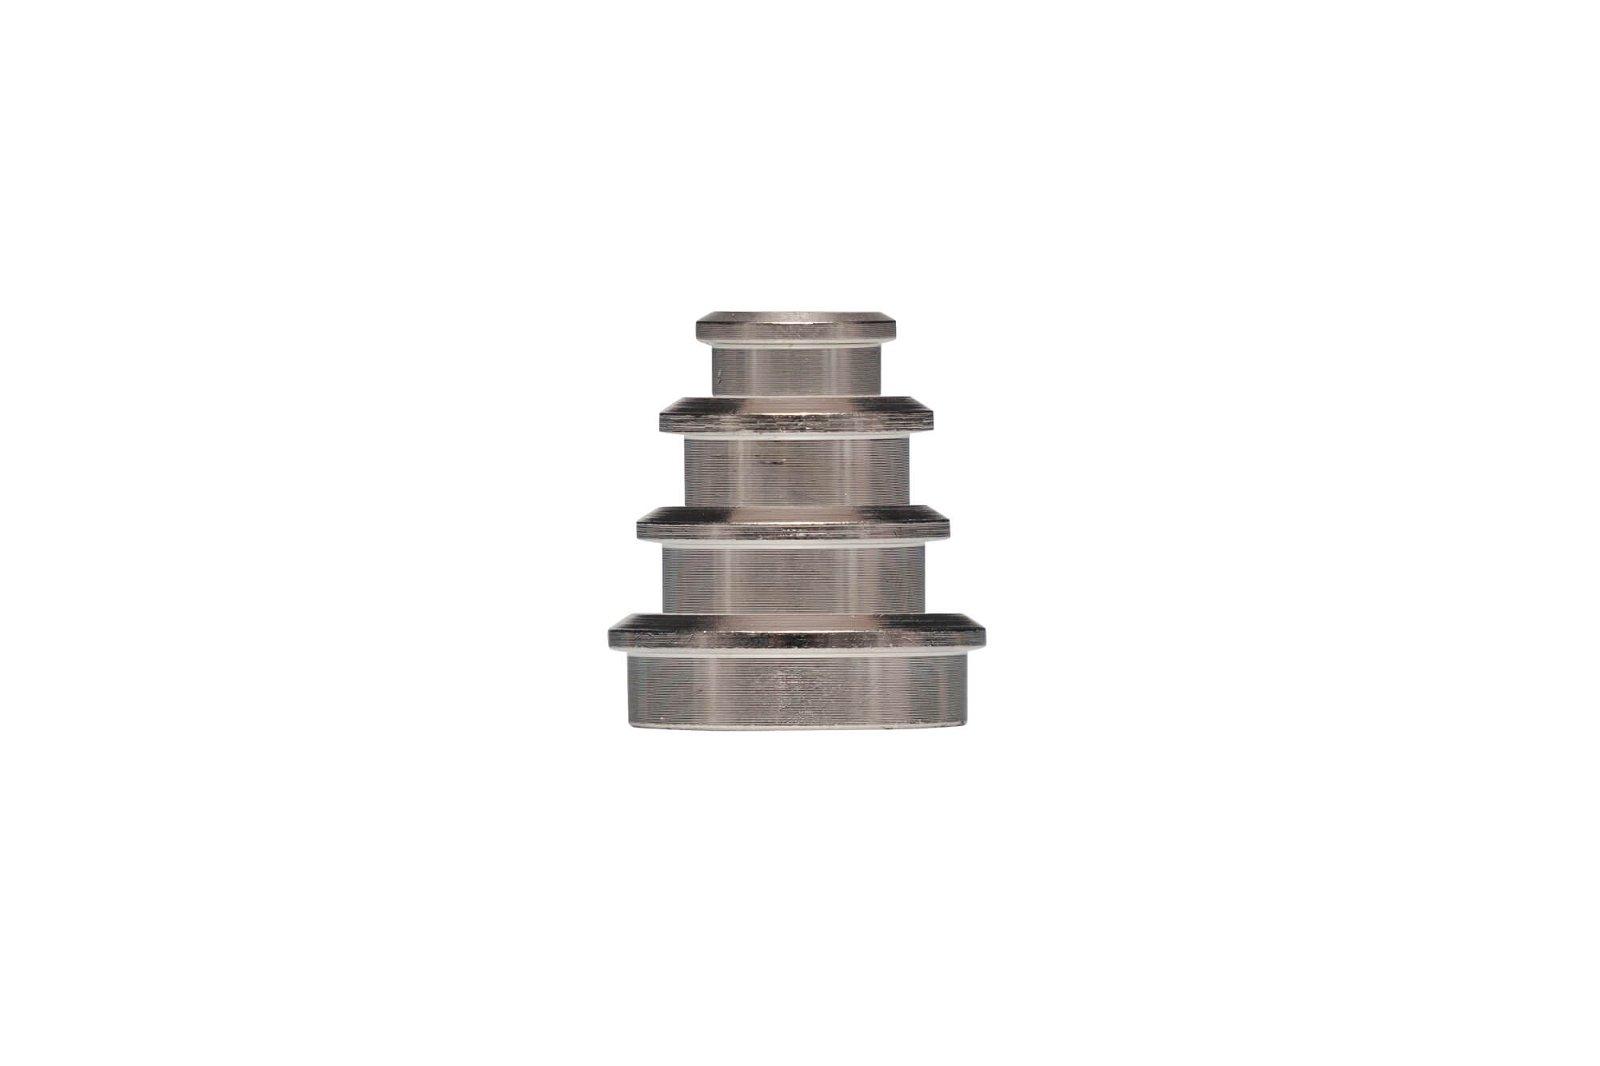 Neodym-Kraftmagnet, Ø 25 mm, 13 kg